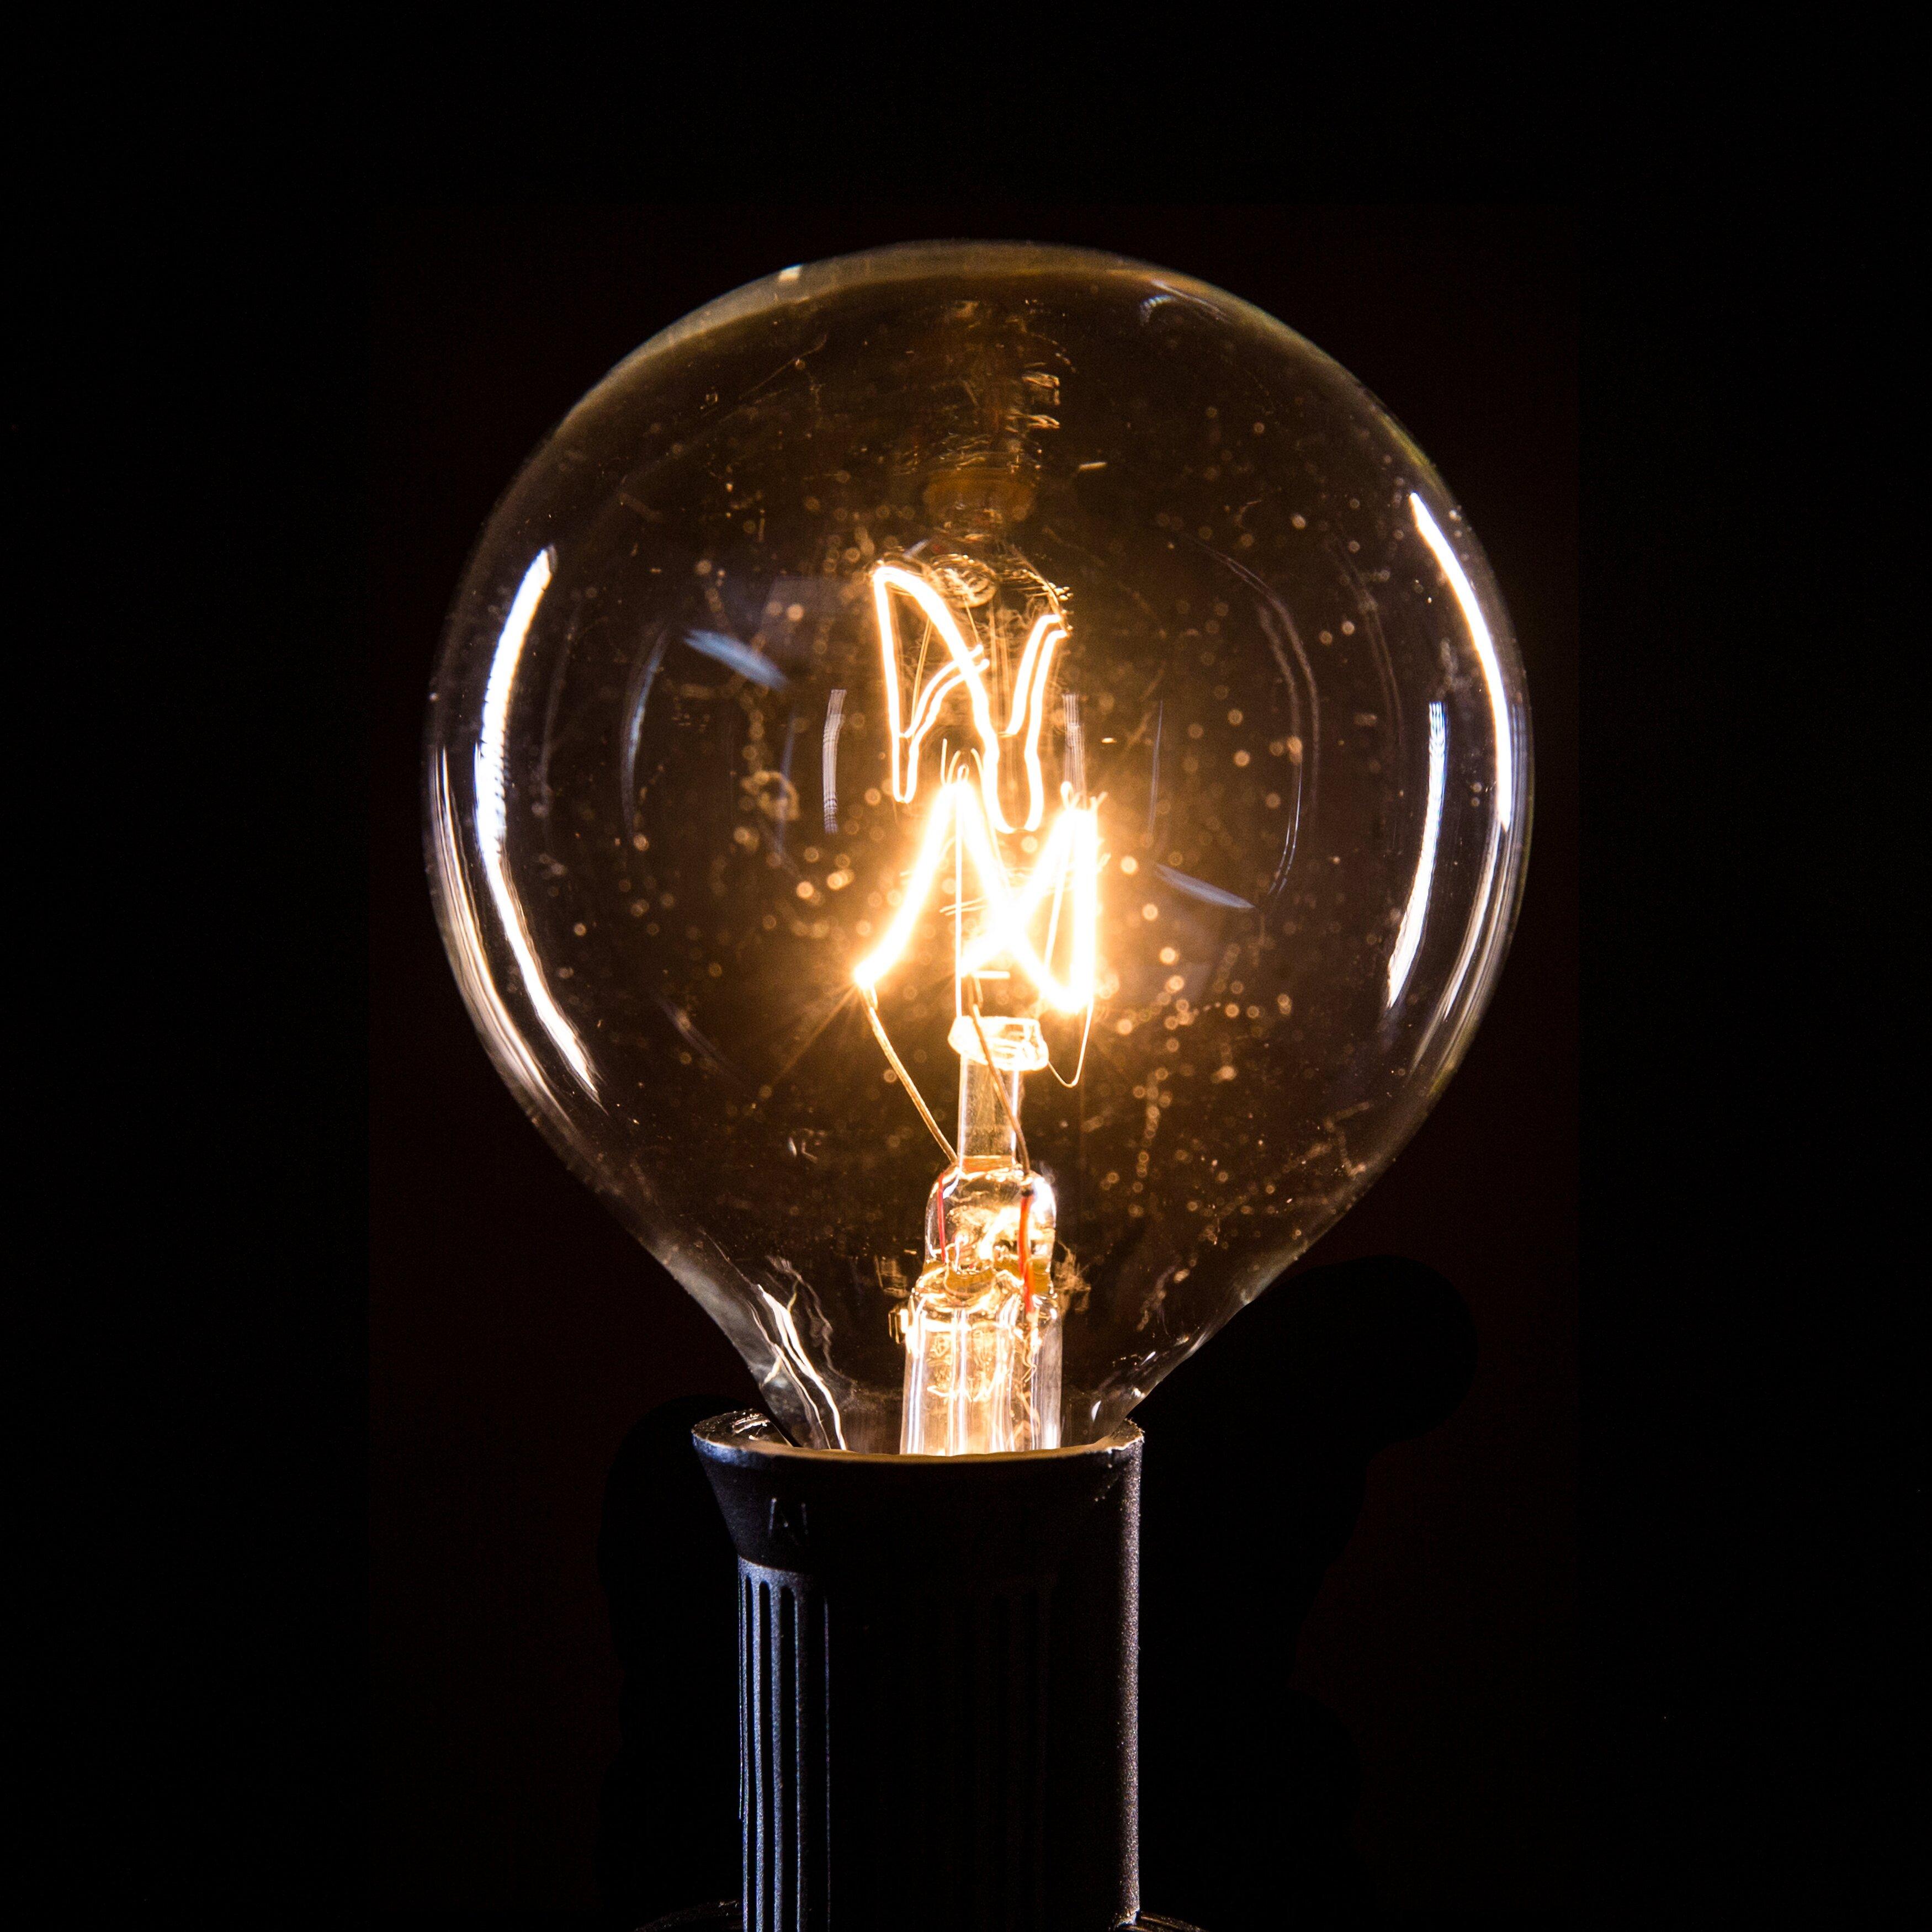 HometownEvolutionInc 100-Light Globe String Lights & Reviews Wayfair